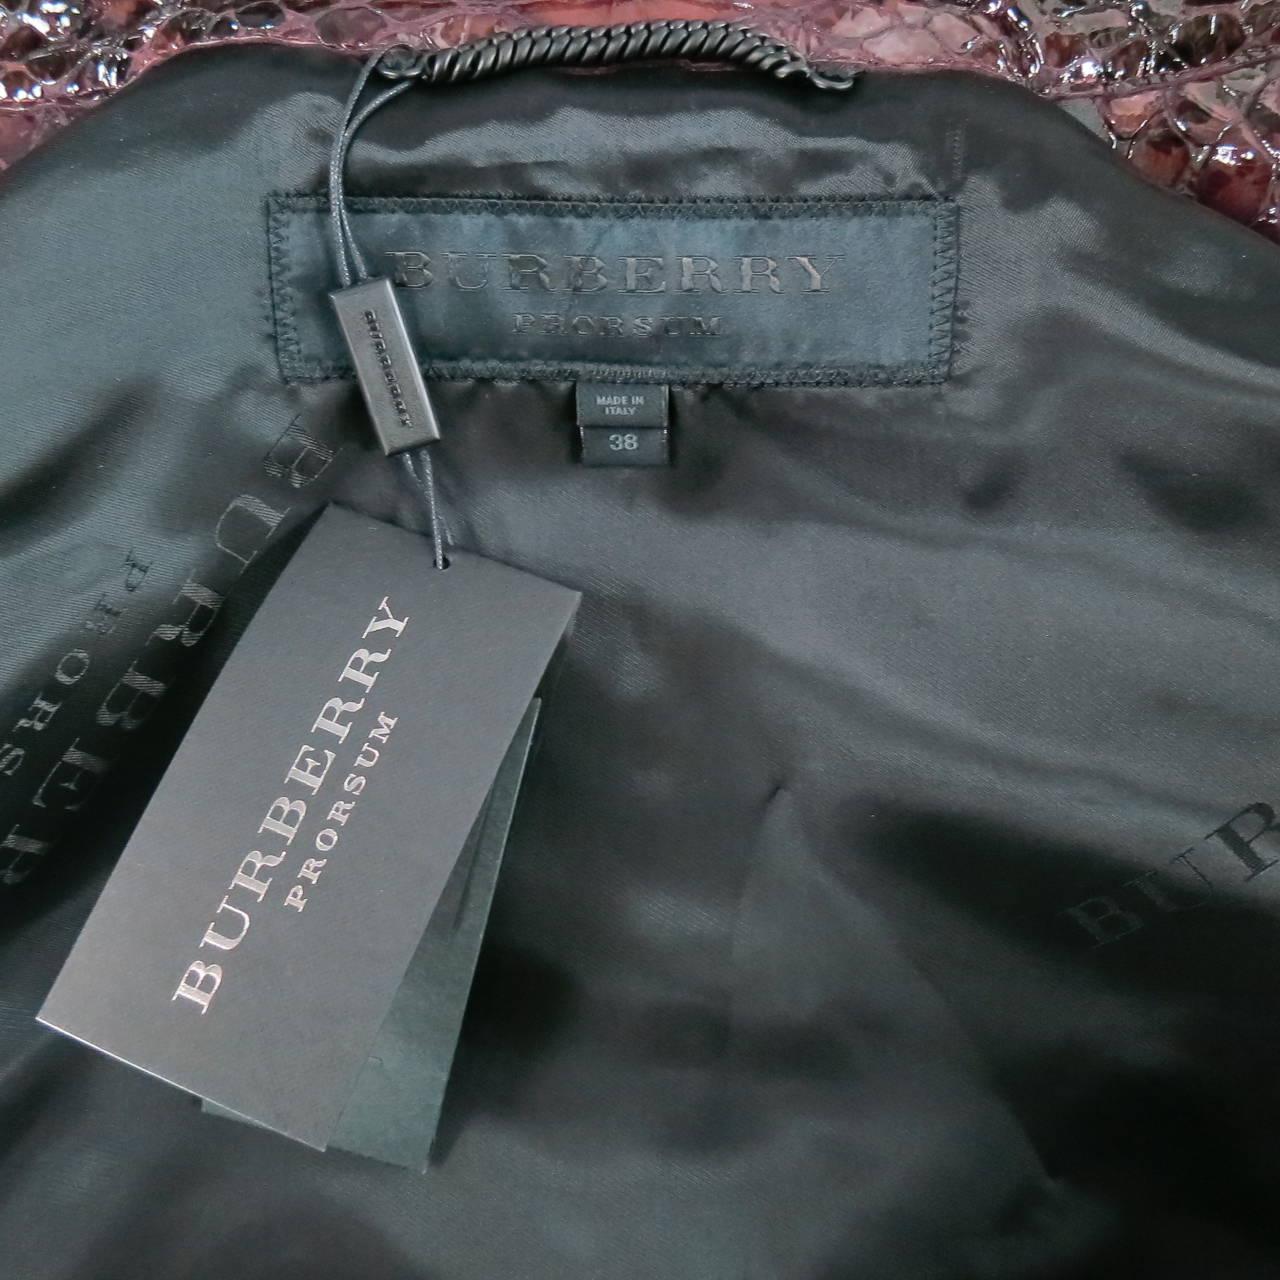 2013's BURBERRY PRORSUM Size 4 Burgundy Python Embossed Patent Leather Jacket 7